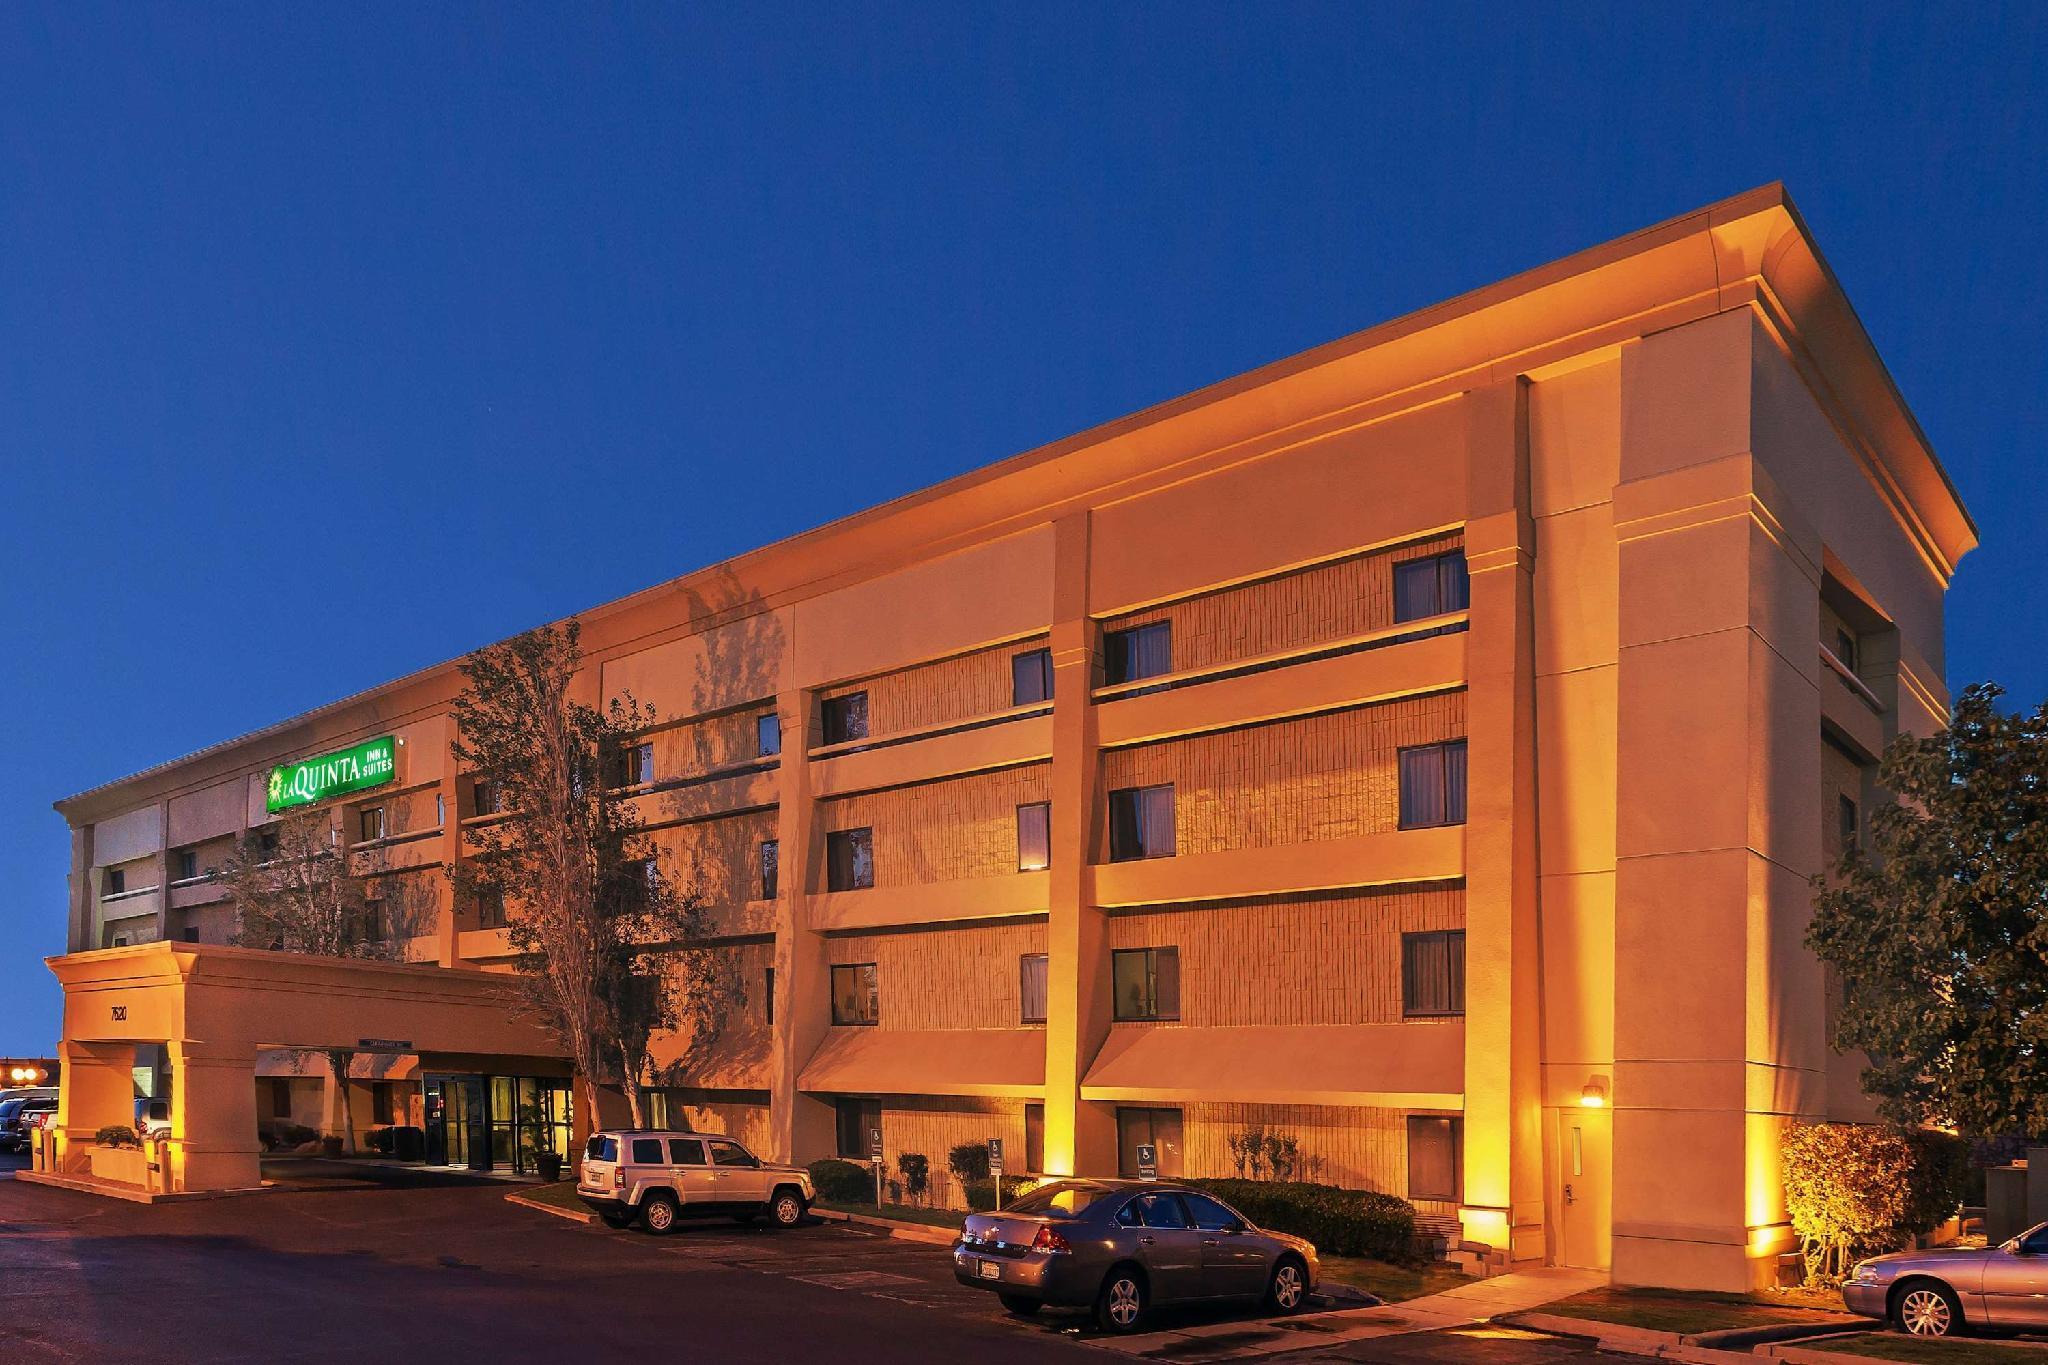 La Quinta Inn And Suites By Wyndham El Paso West Bartlett